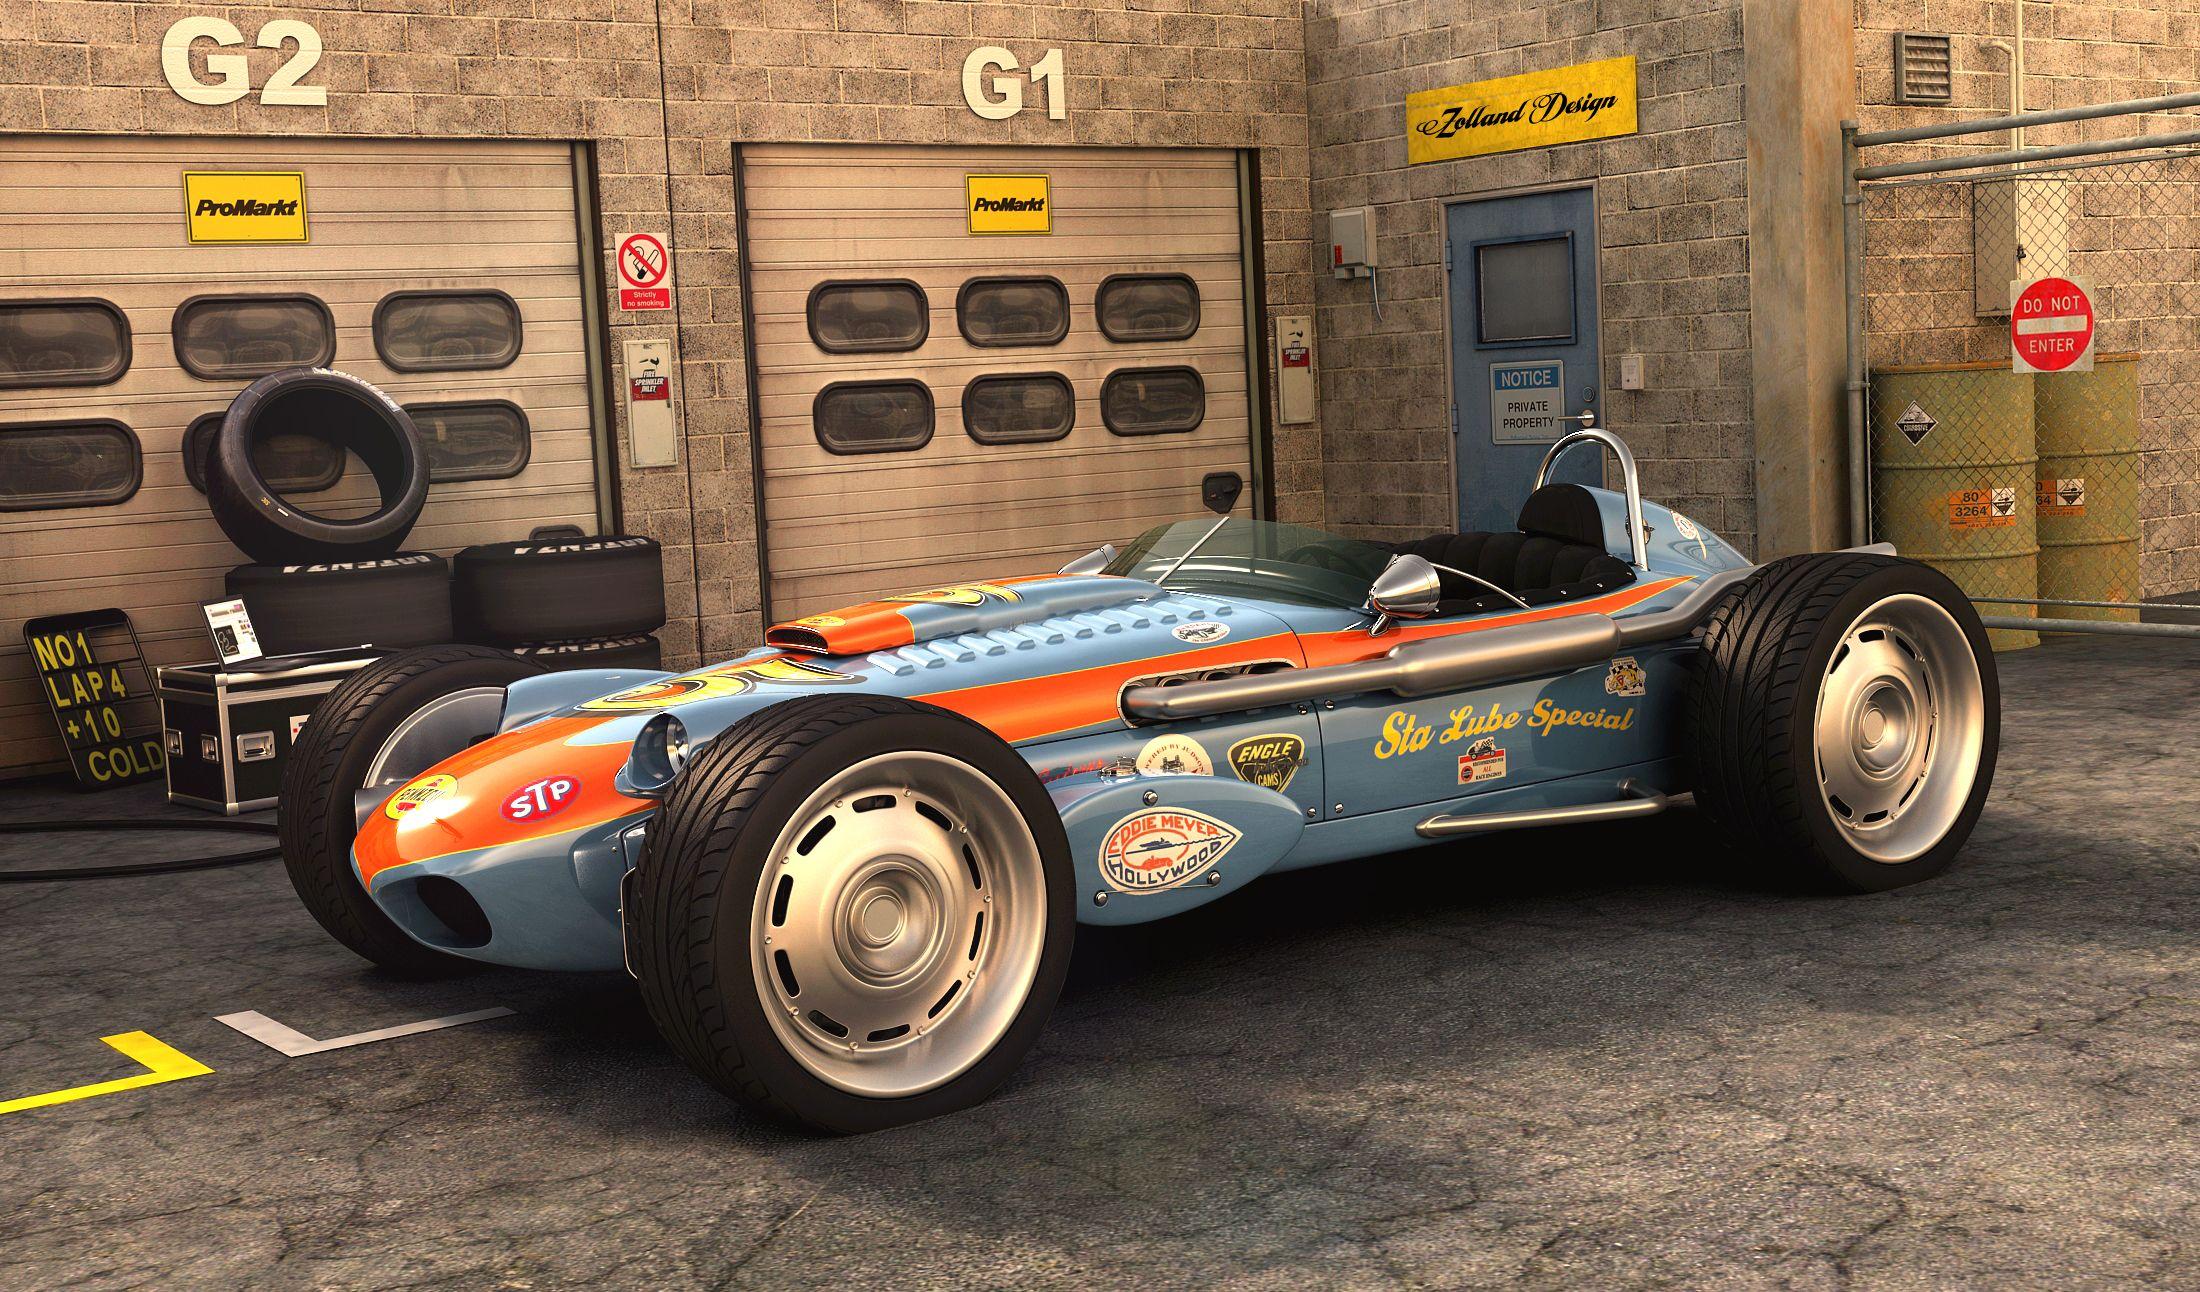 Lotus 7 kit car usa - Car Stuff